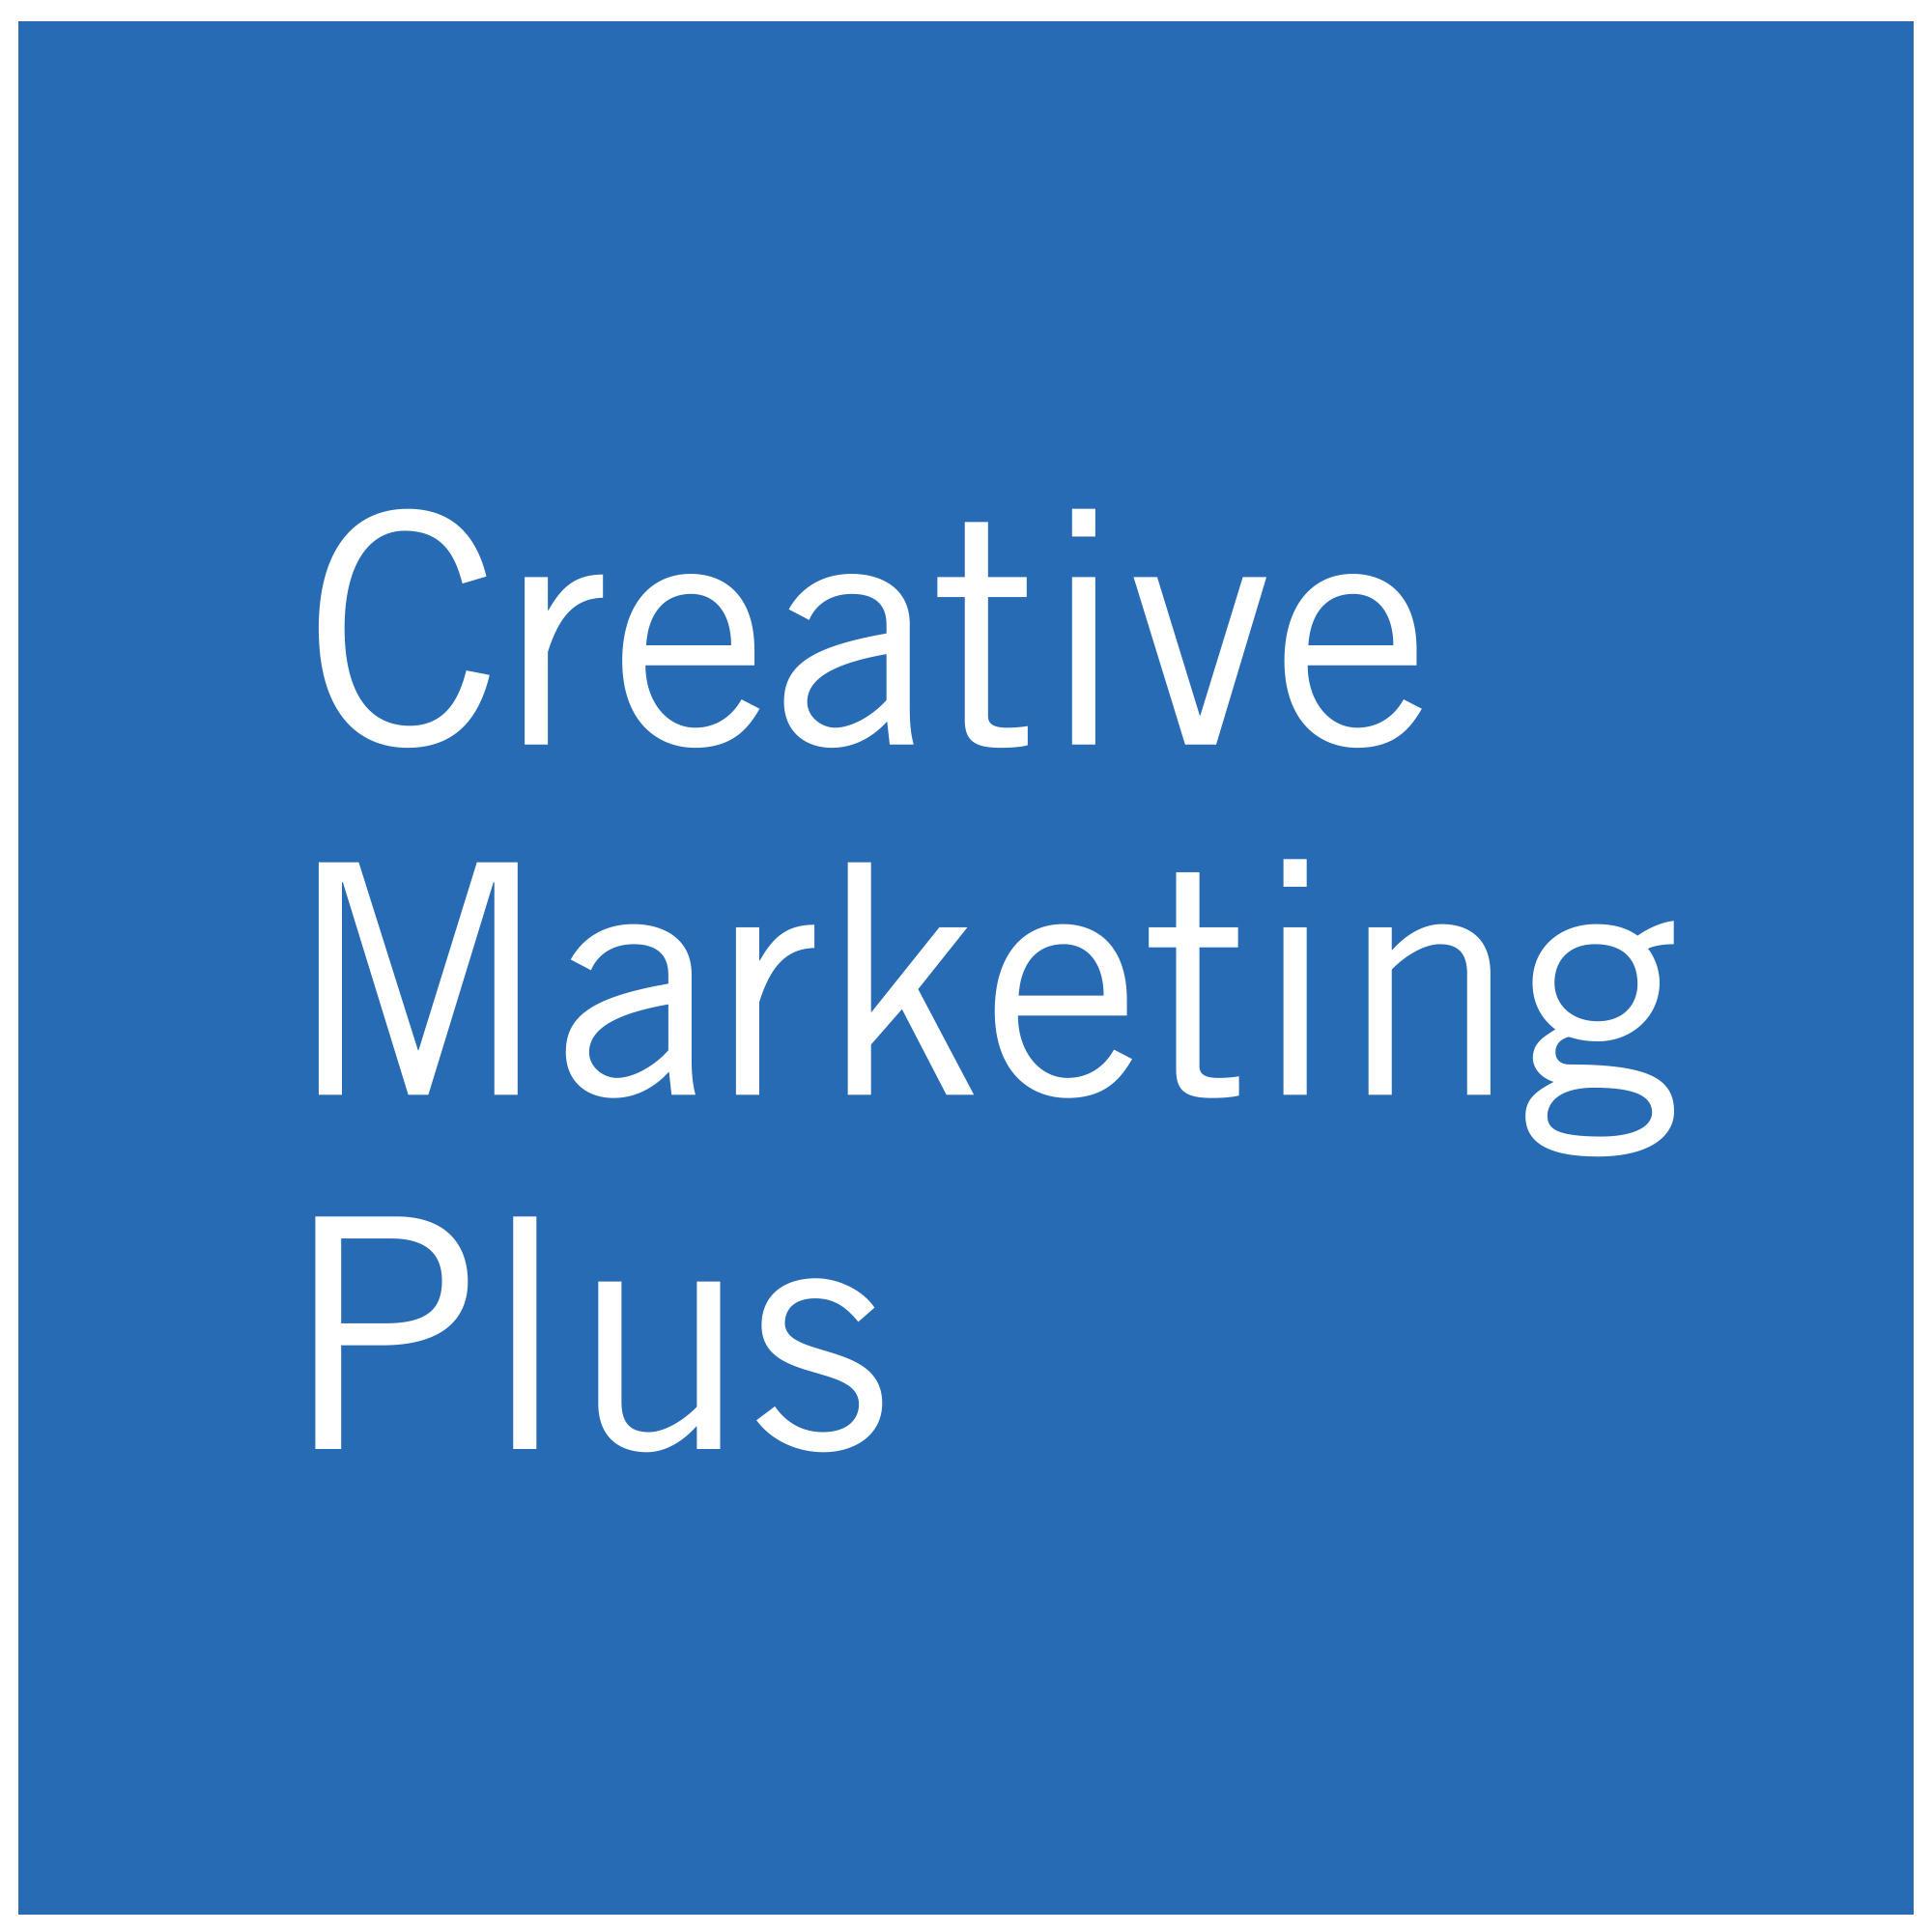 Creative Marketing Plus